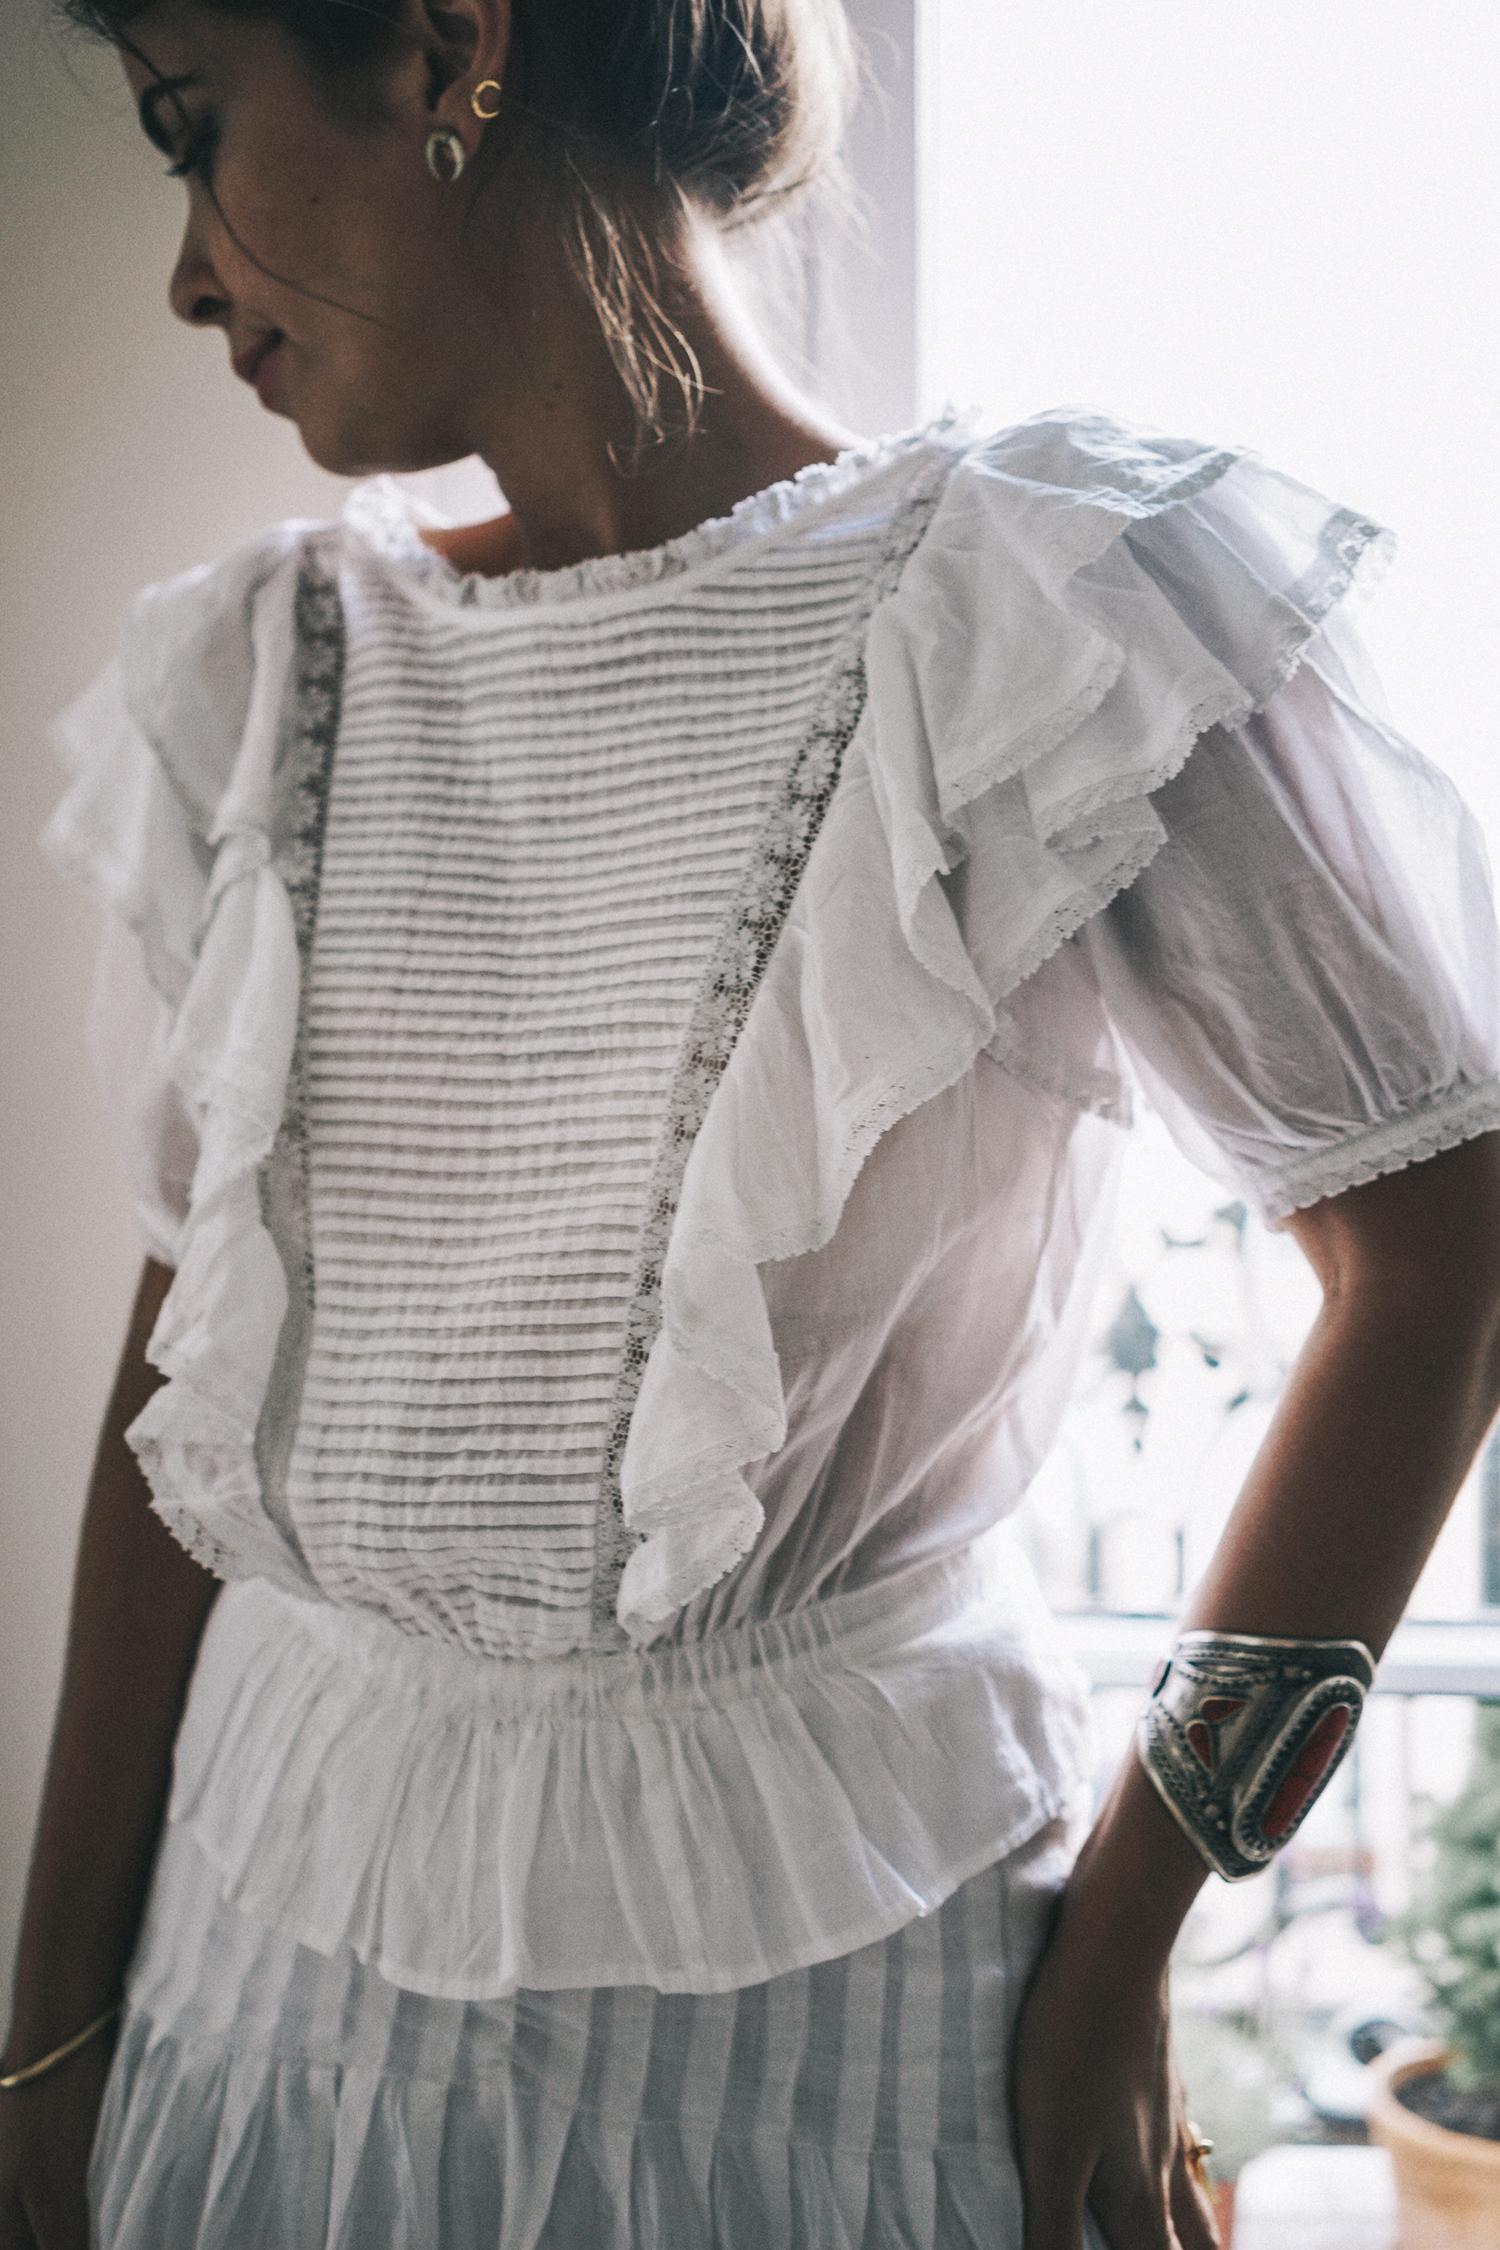 Home_Away-Isabel_Marant_Dress-Outfit-Paris-Collage_Vintage-50